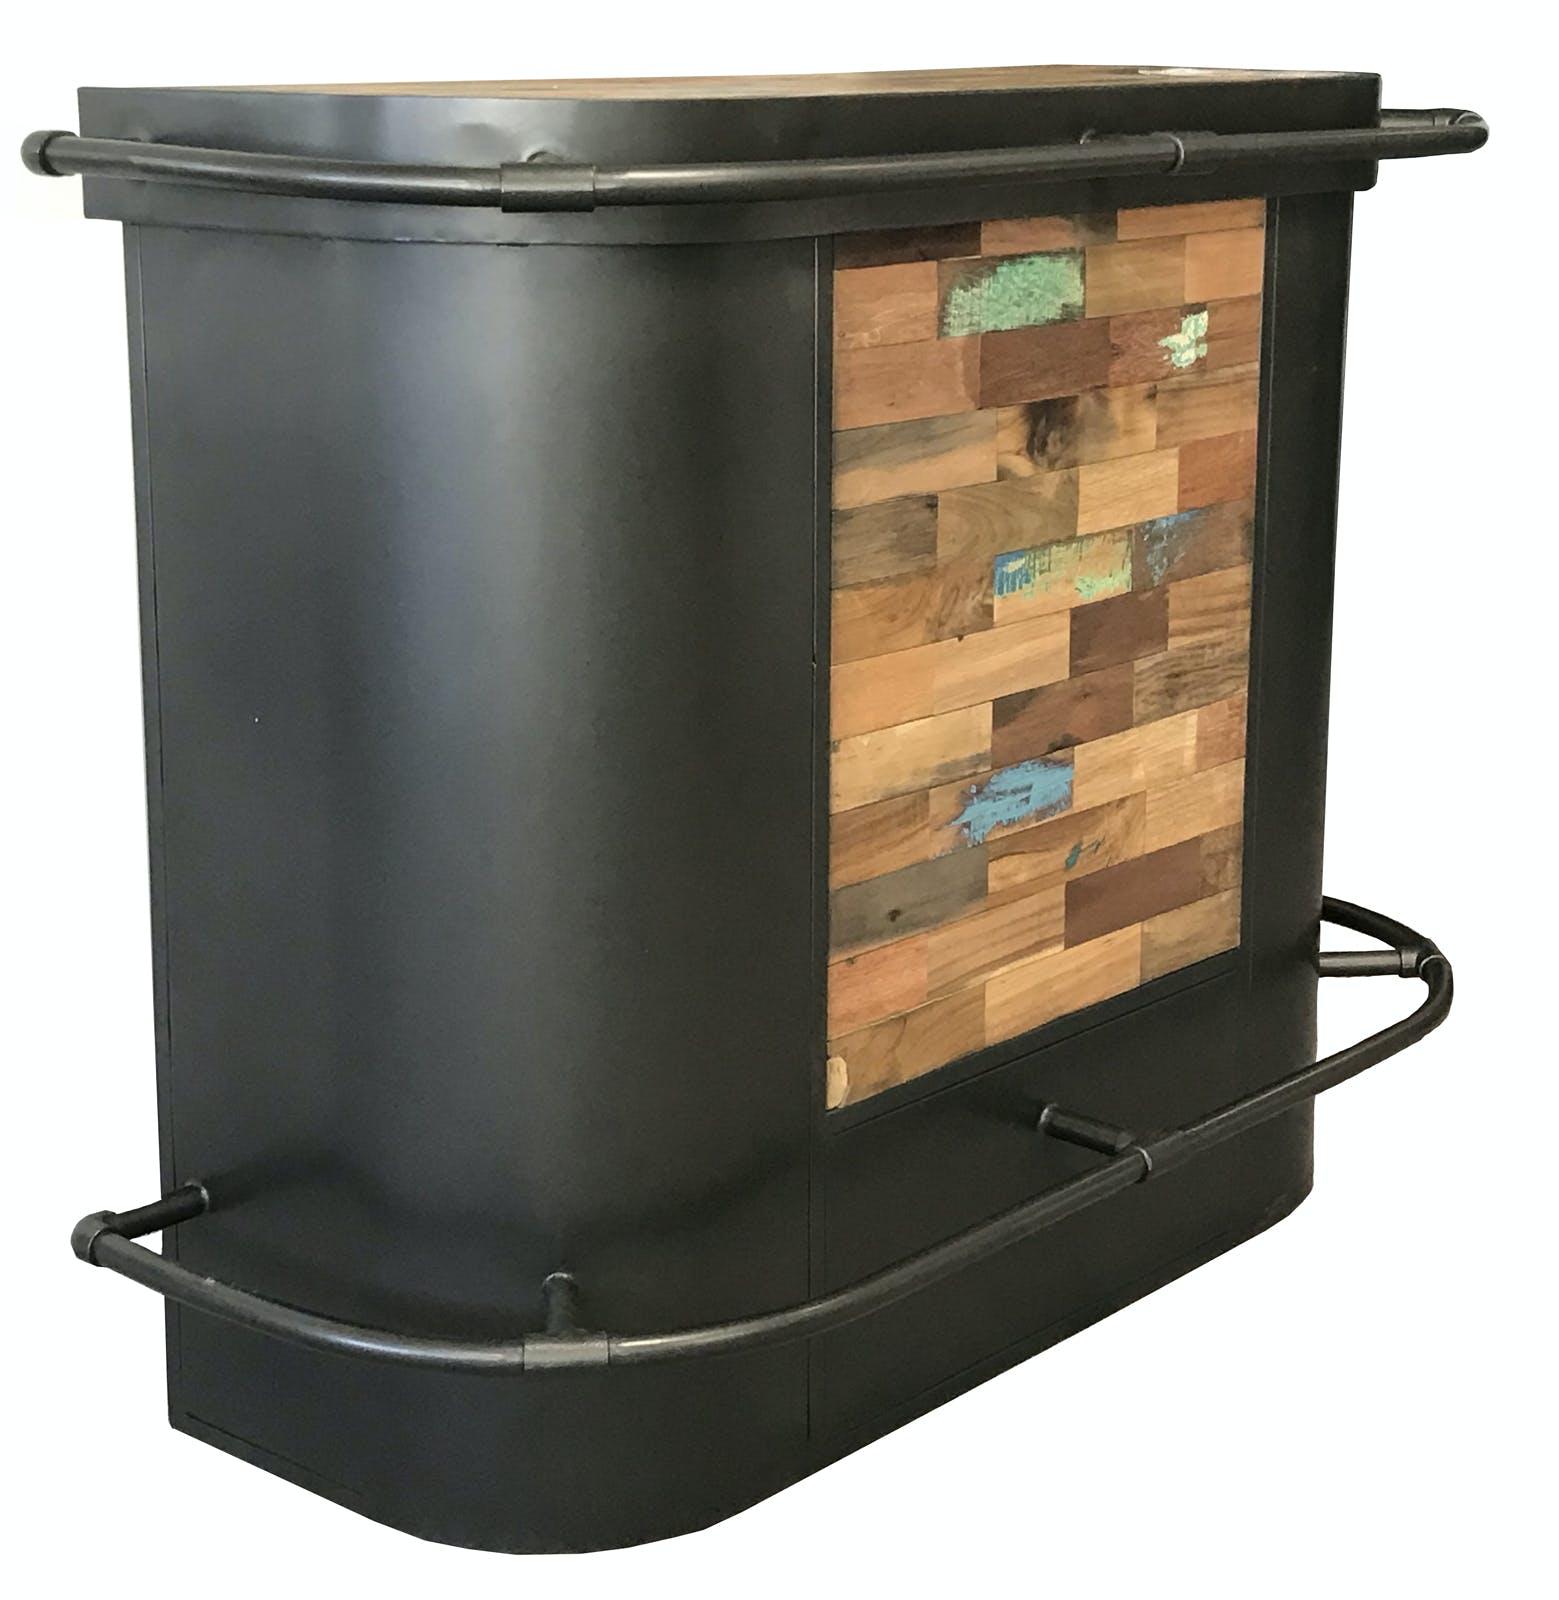 Meuble bar bois recyclé central 144x60 CARAVELLE